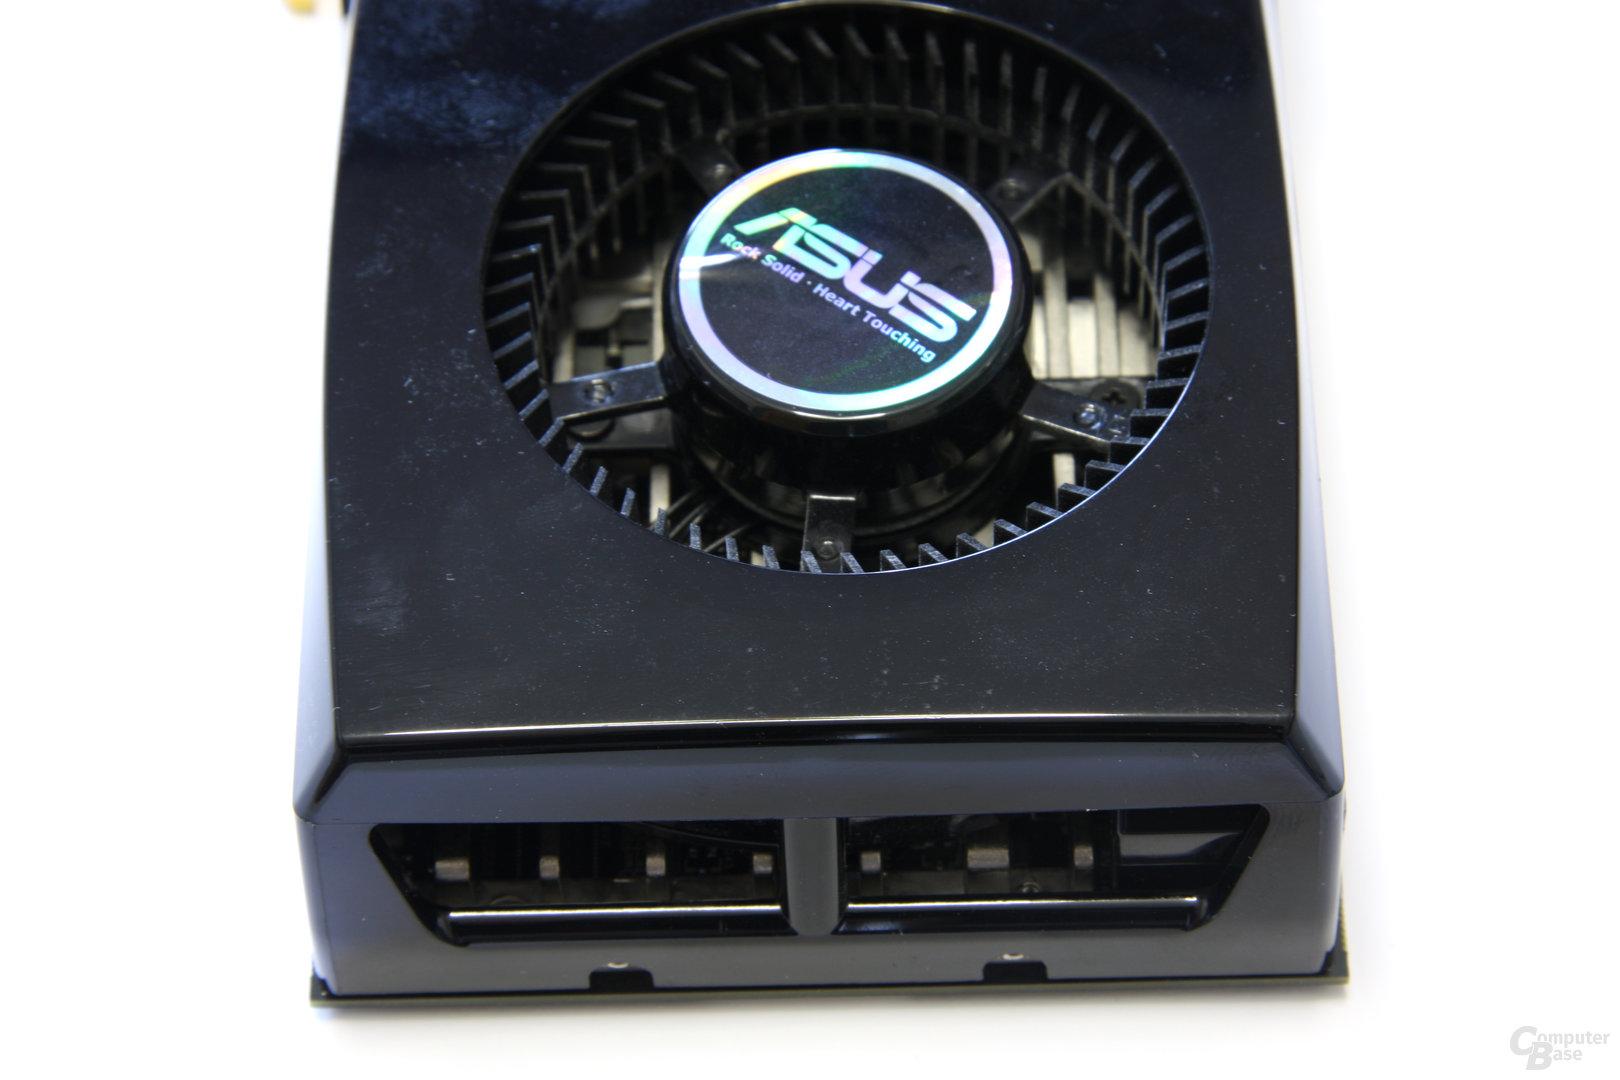 GeForce GTX 285 Kühlerende